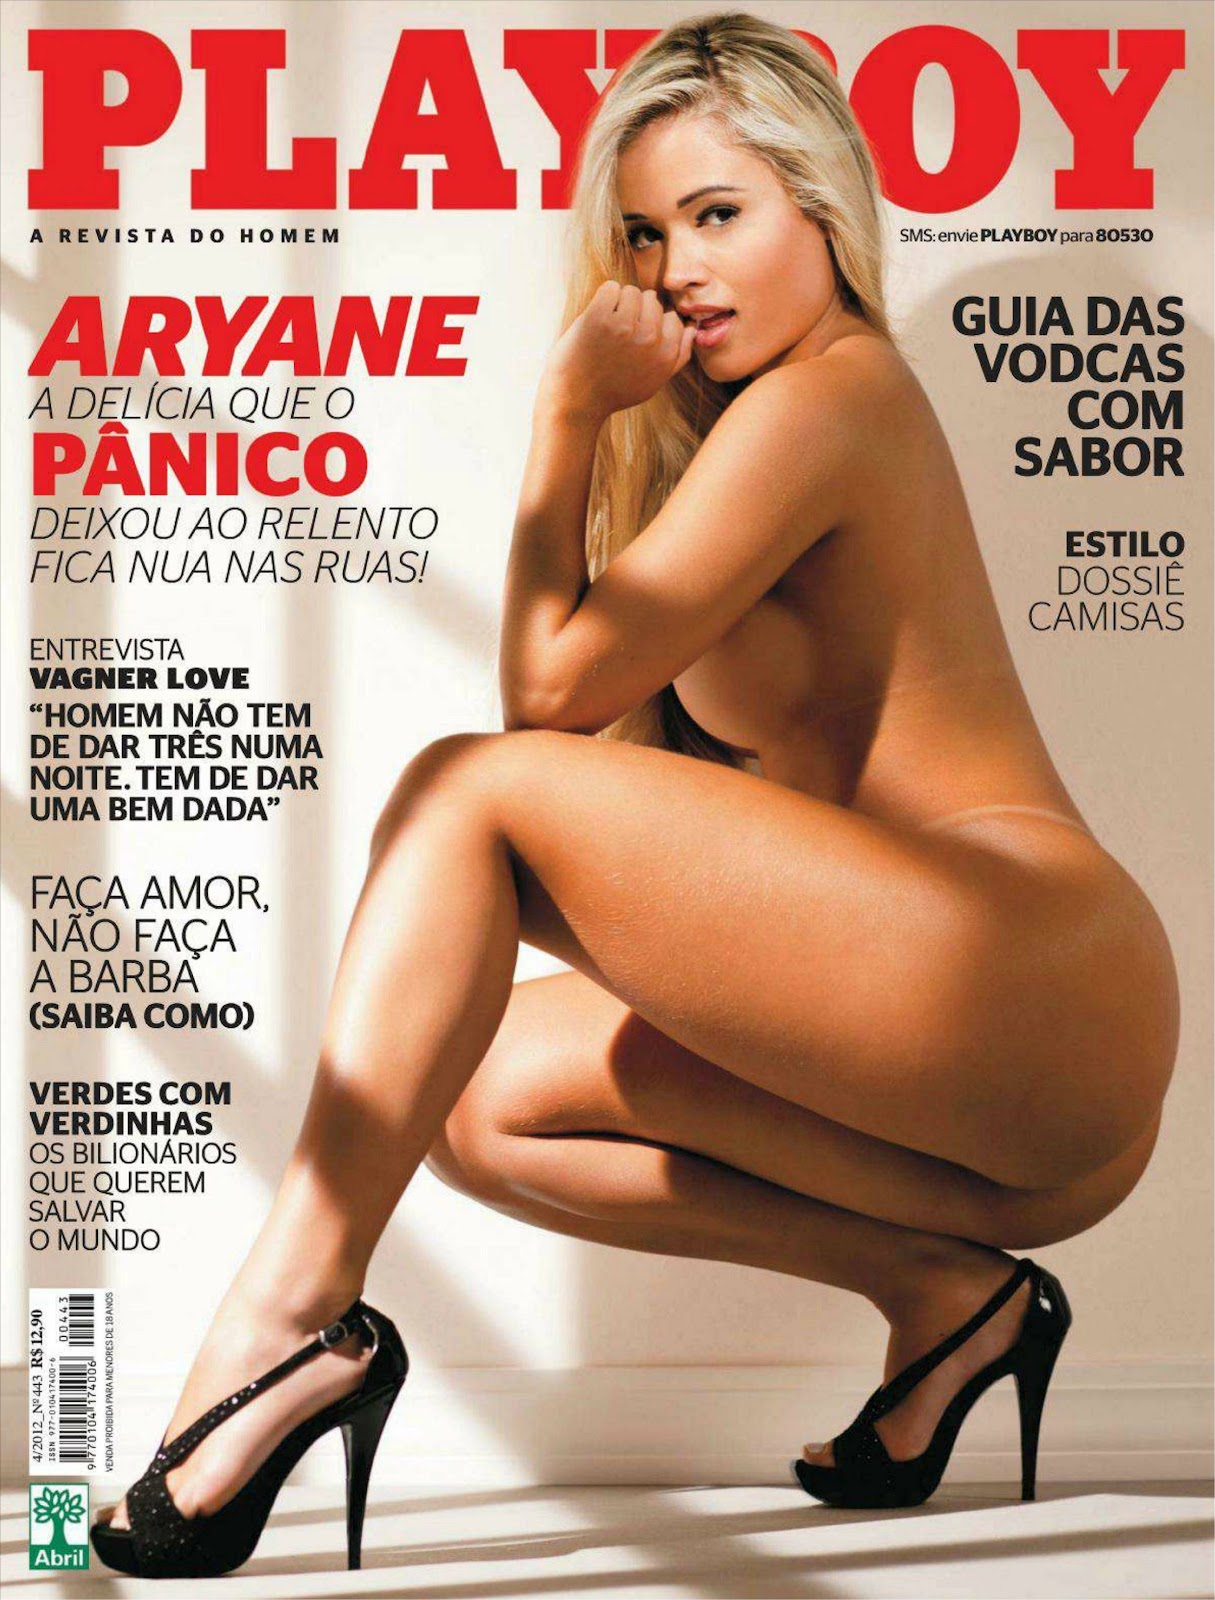 http://2.bp.blogspot.com/-Tiu4XglaeZY/T5Gl2xJ4-DI/AAAAAAAARtM/BKrWwMr10tE/s1600/Playboy+Brasil+-+Abril+de+2012.jpeg